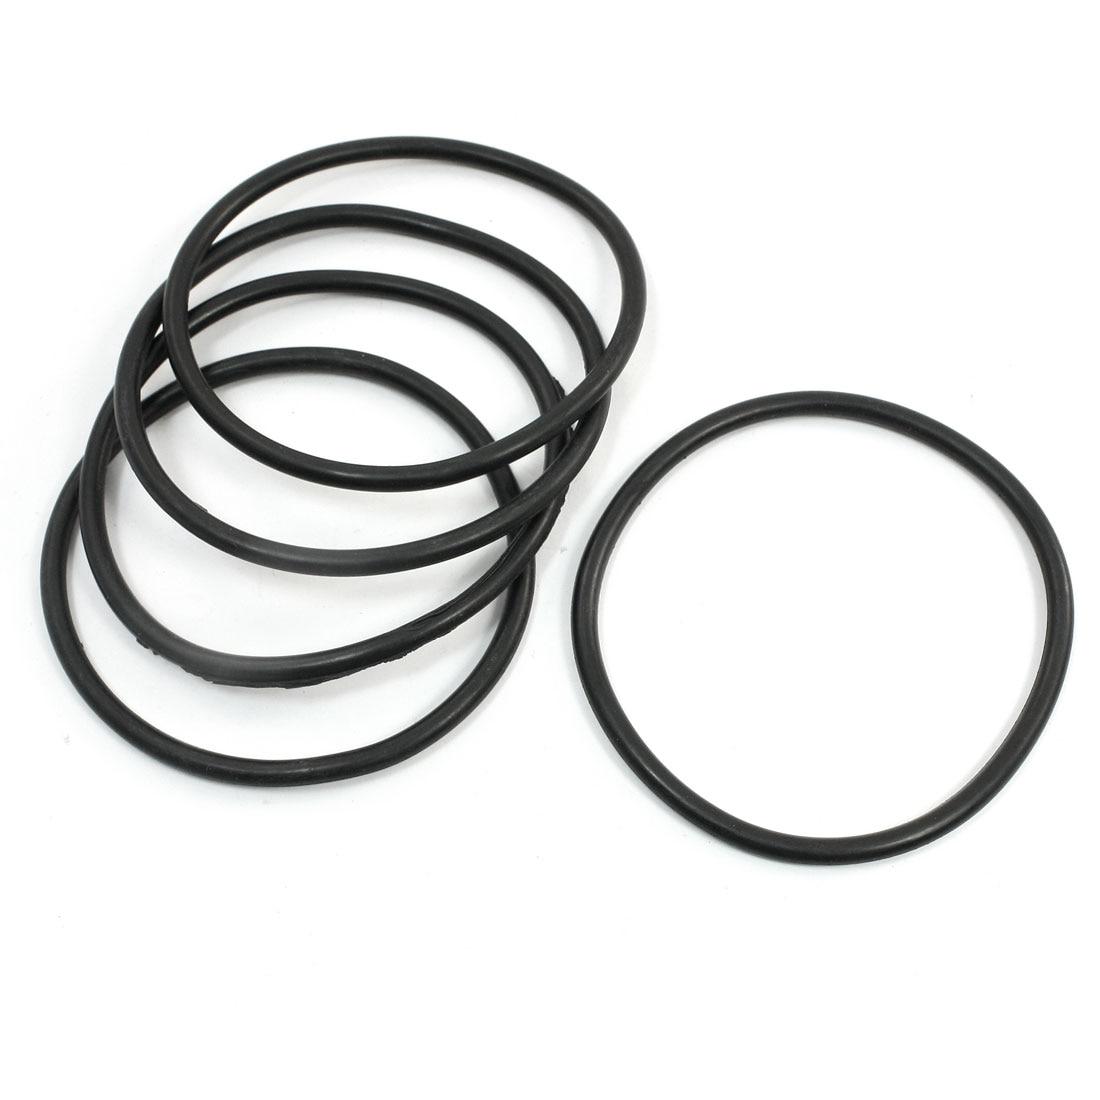 O-Rings Nitrile Rubber 142mm x 150mm x 4mm Seal Rings Sealing Gasket